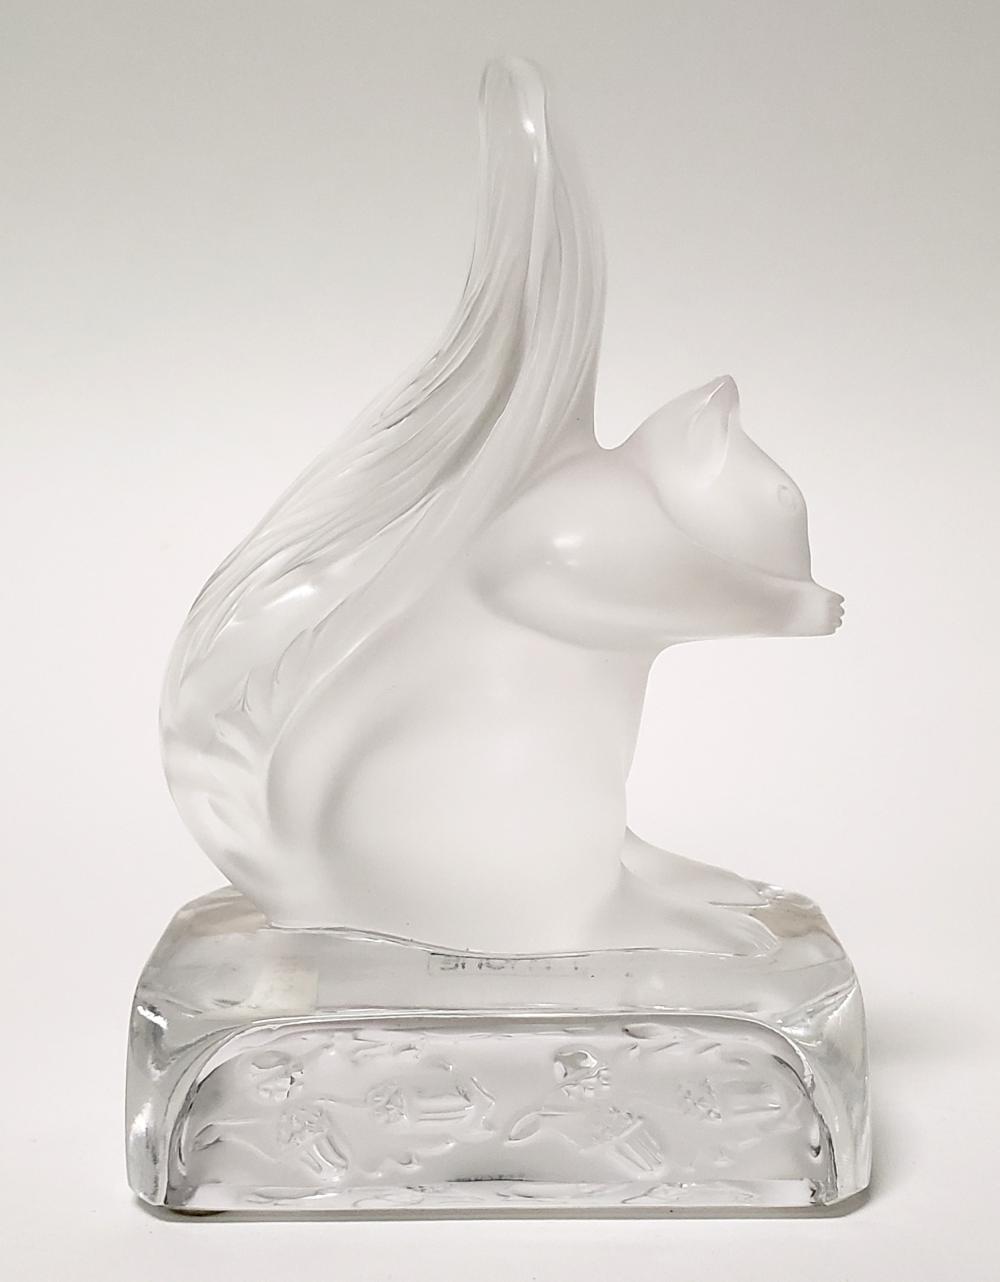 Lalique Crystal Figure of a Squirrel